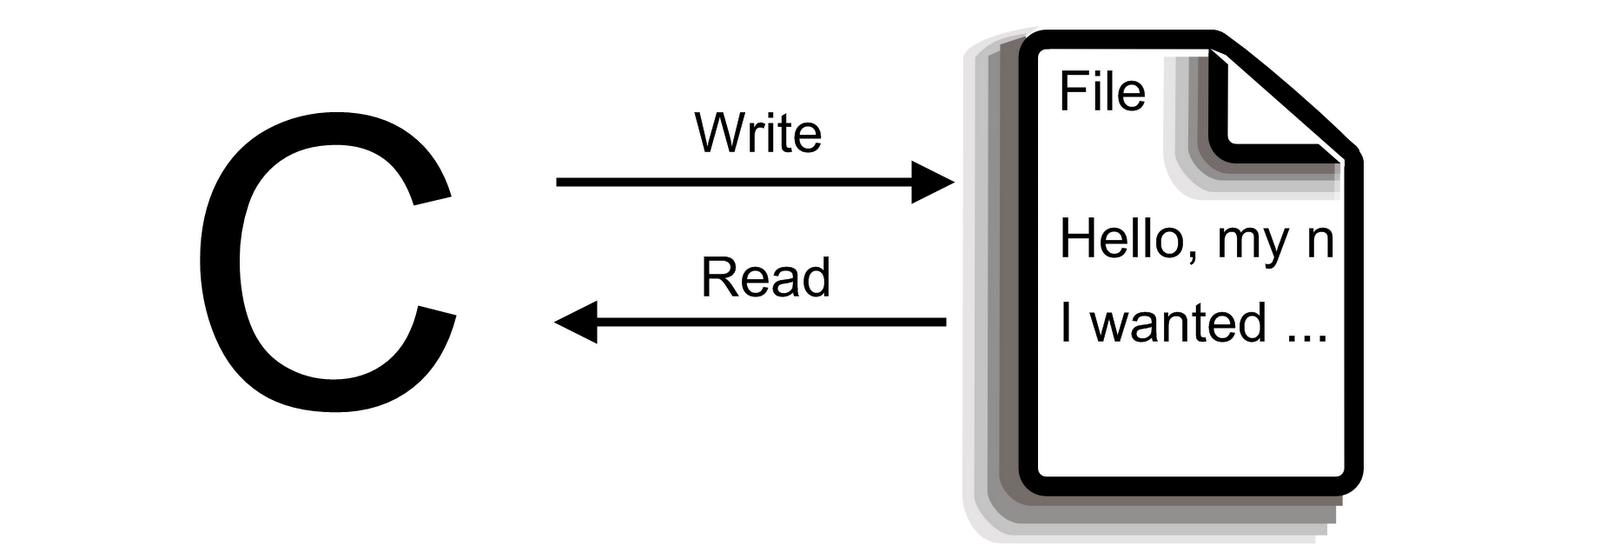 File Handling in C - Part 1